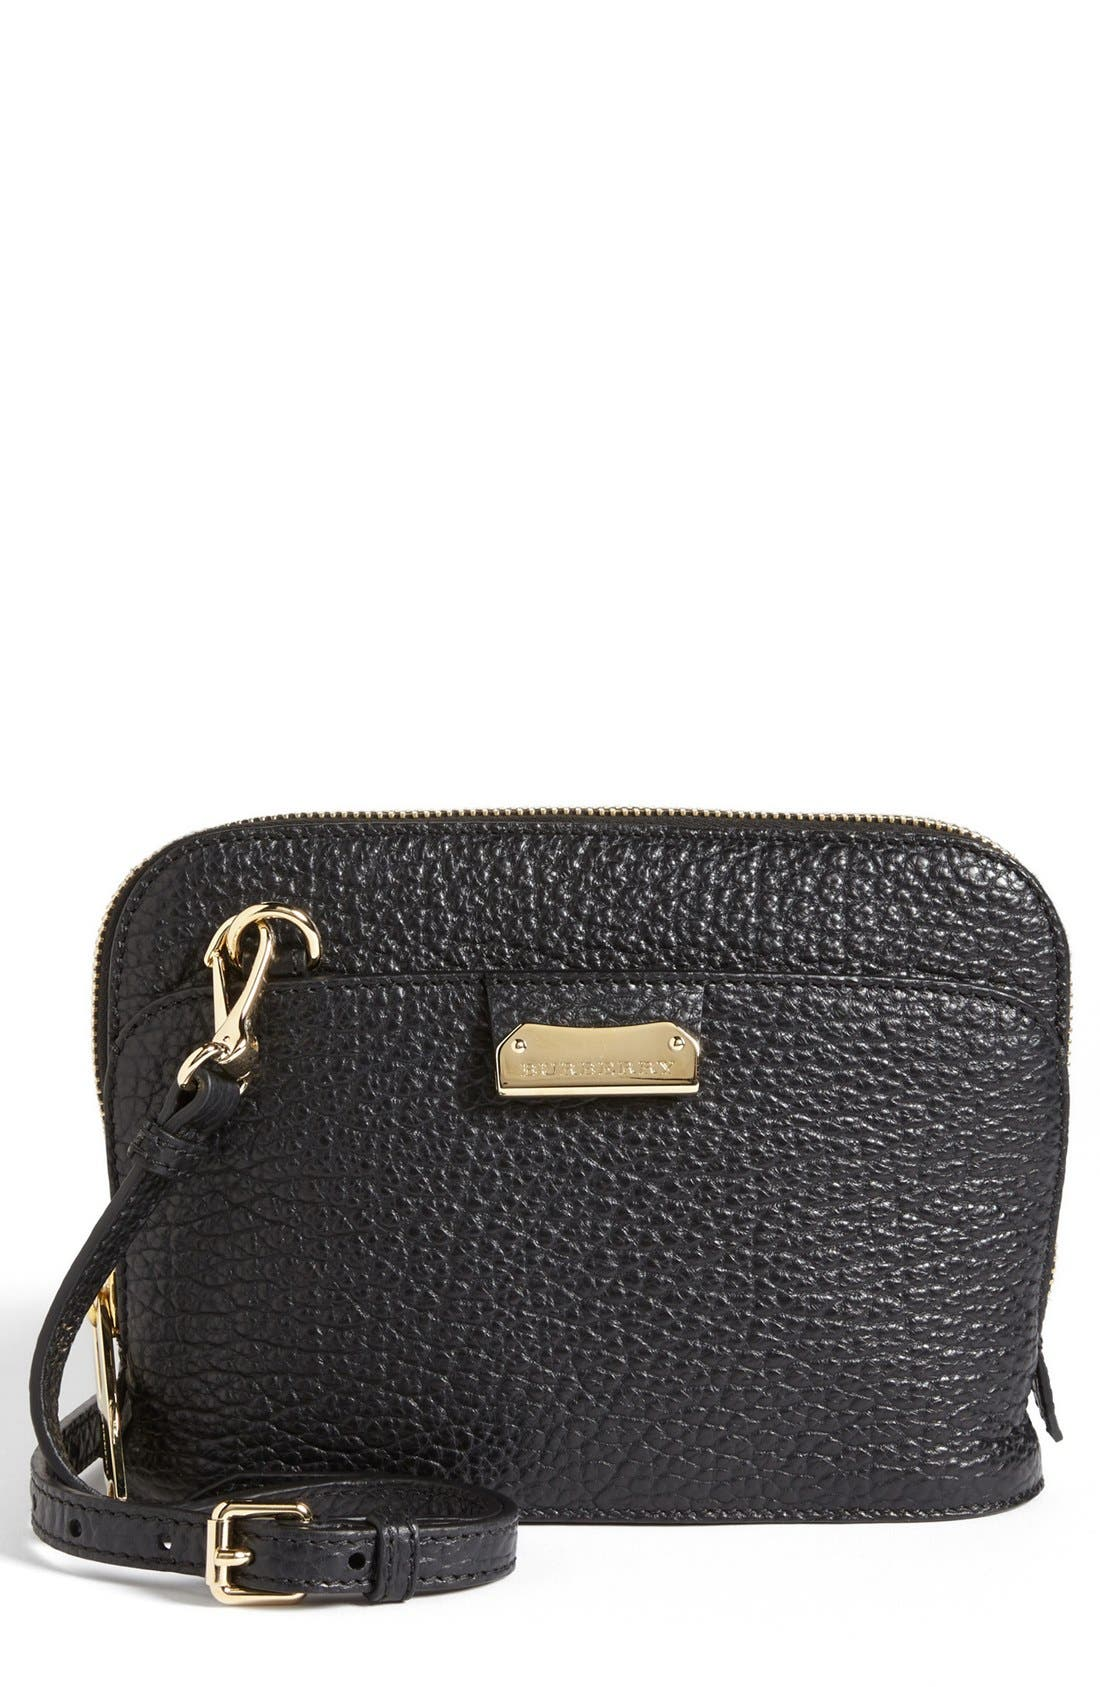 Main Image - Burberry 'Small Harrogate' Leather Crossbody Bag